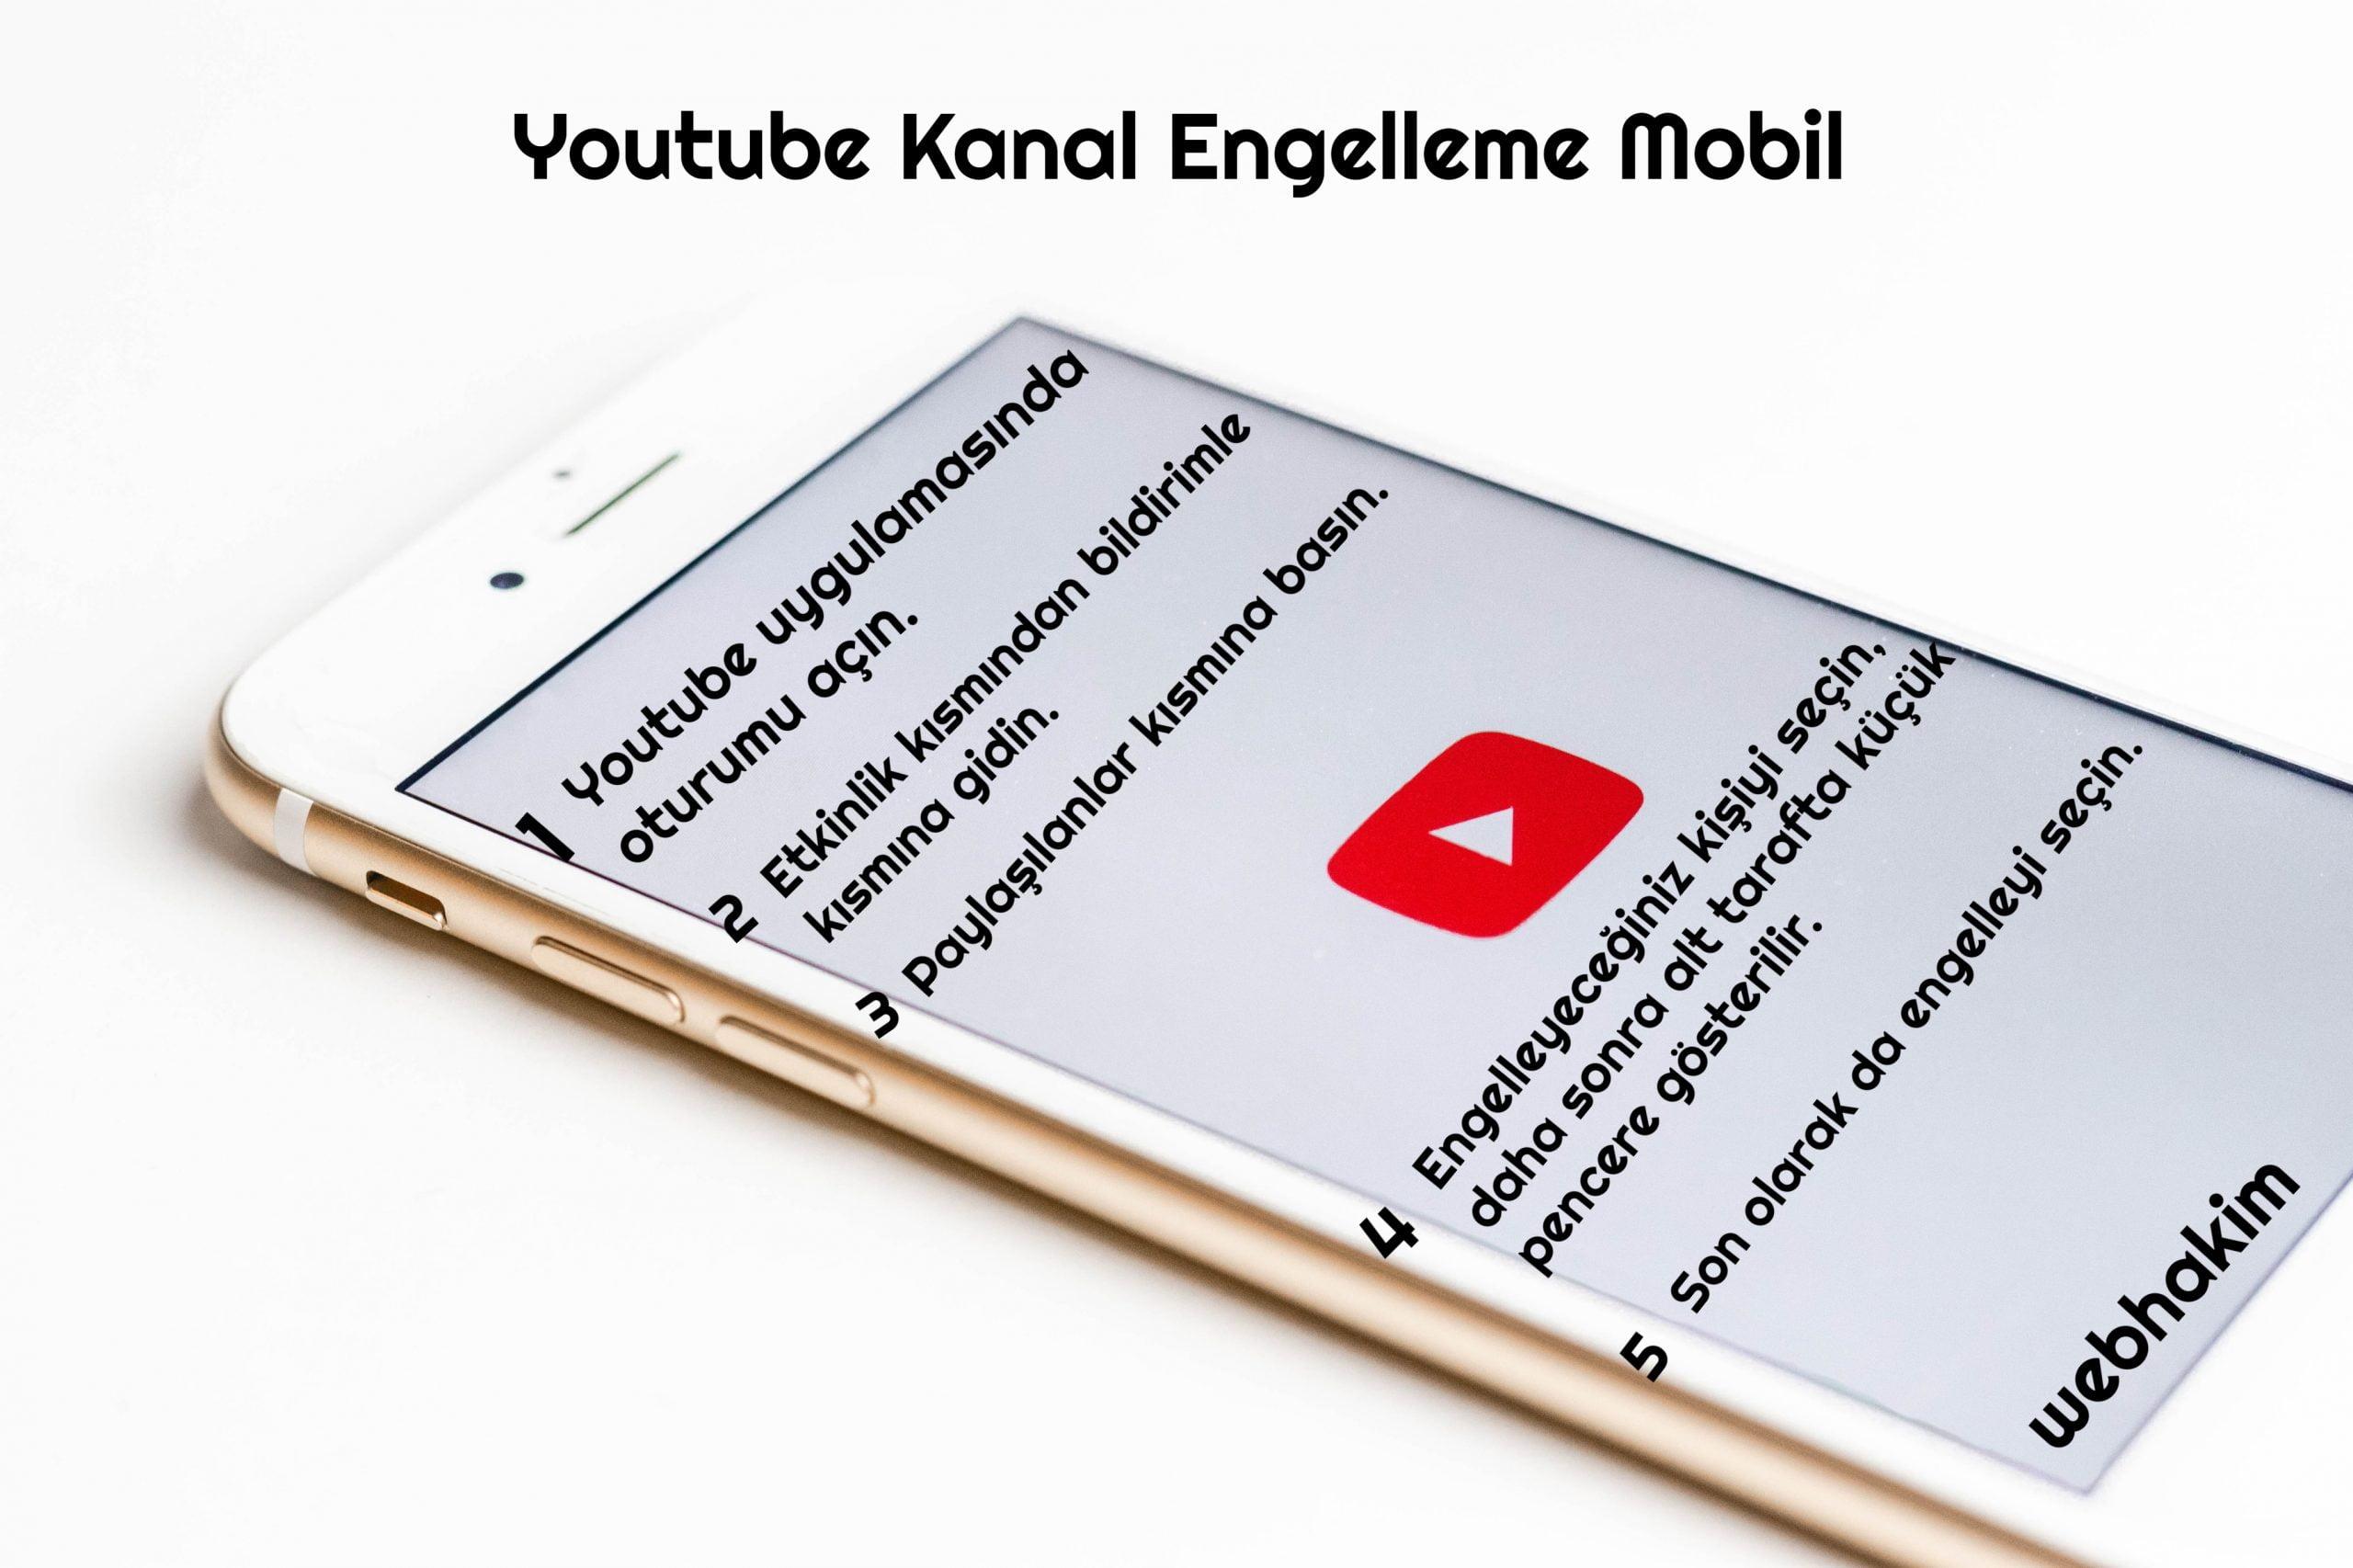 youtube kanal engelleme mobil webhakim